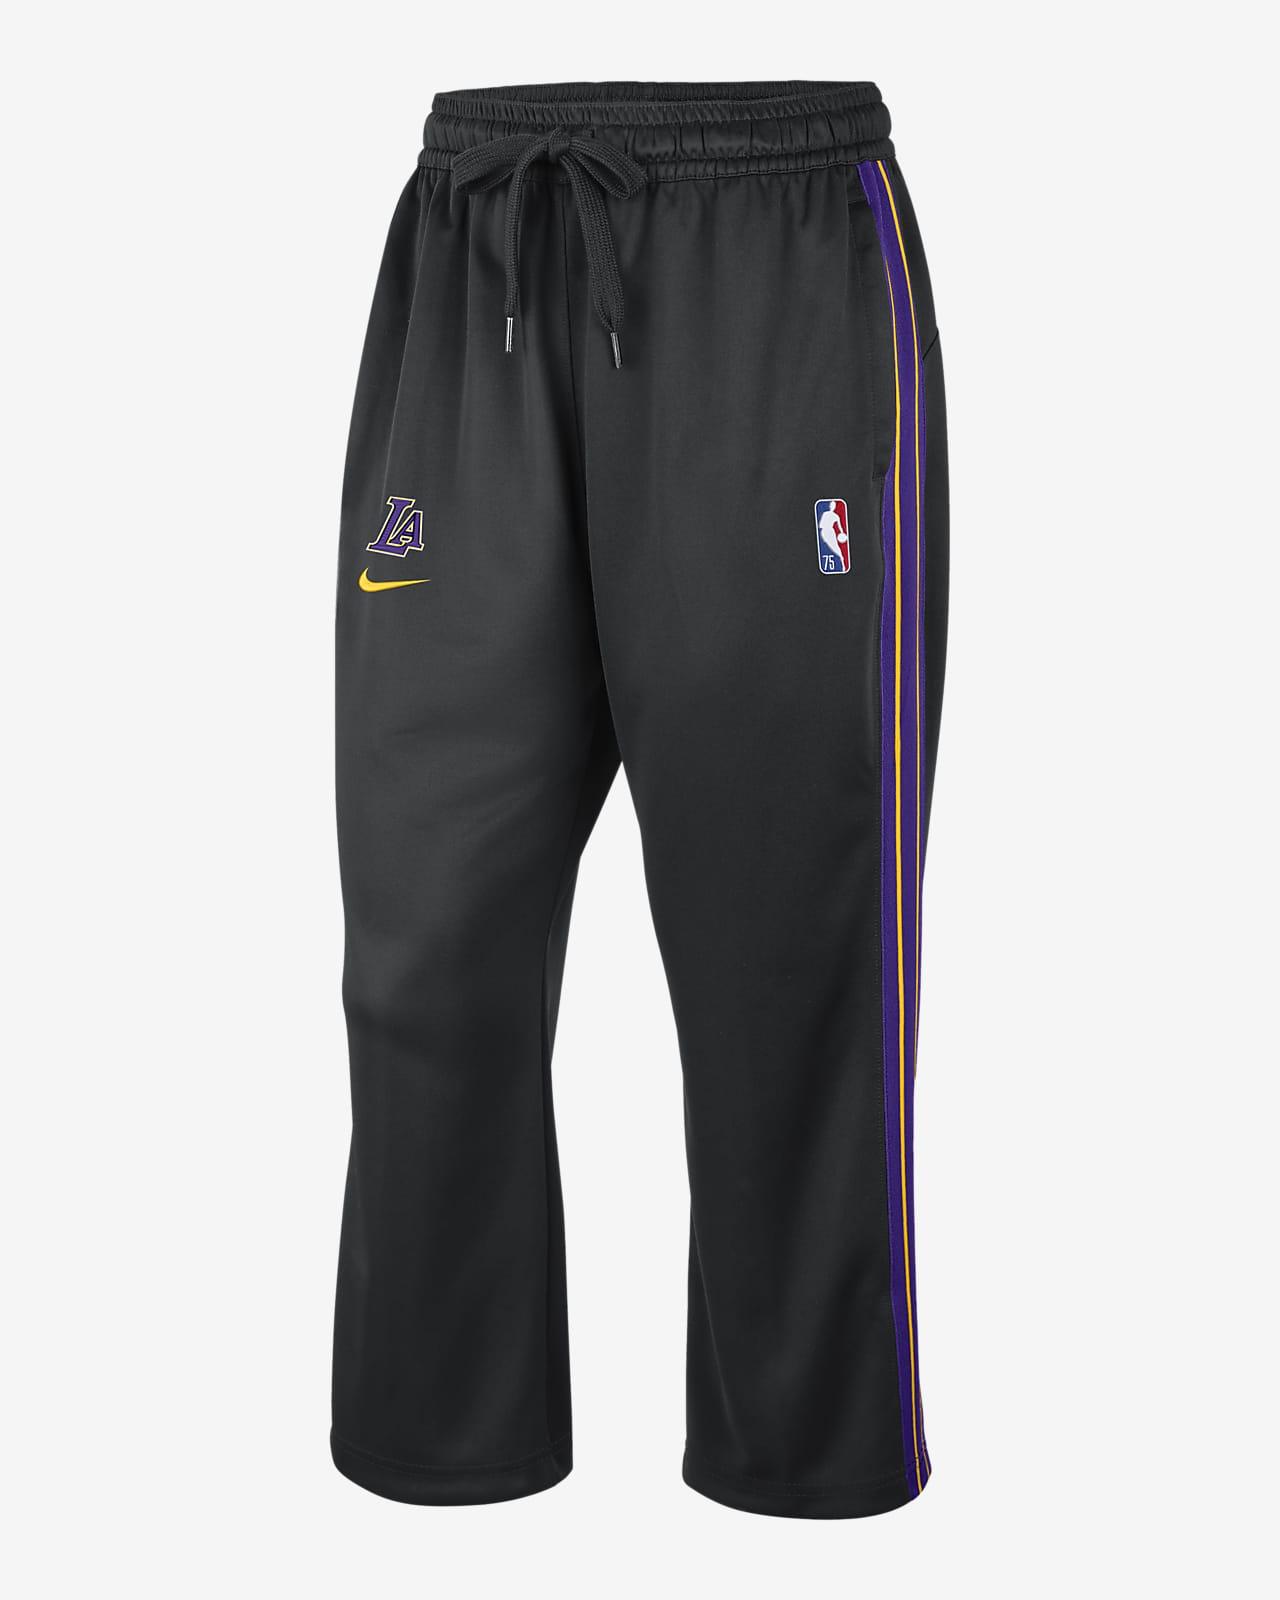 Pantaloni tuta Los Angeles Lakers Courtside Nike NBA - Donna